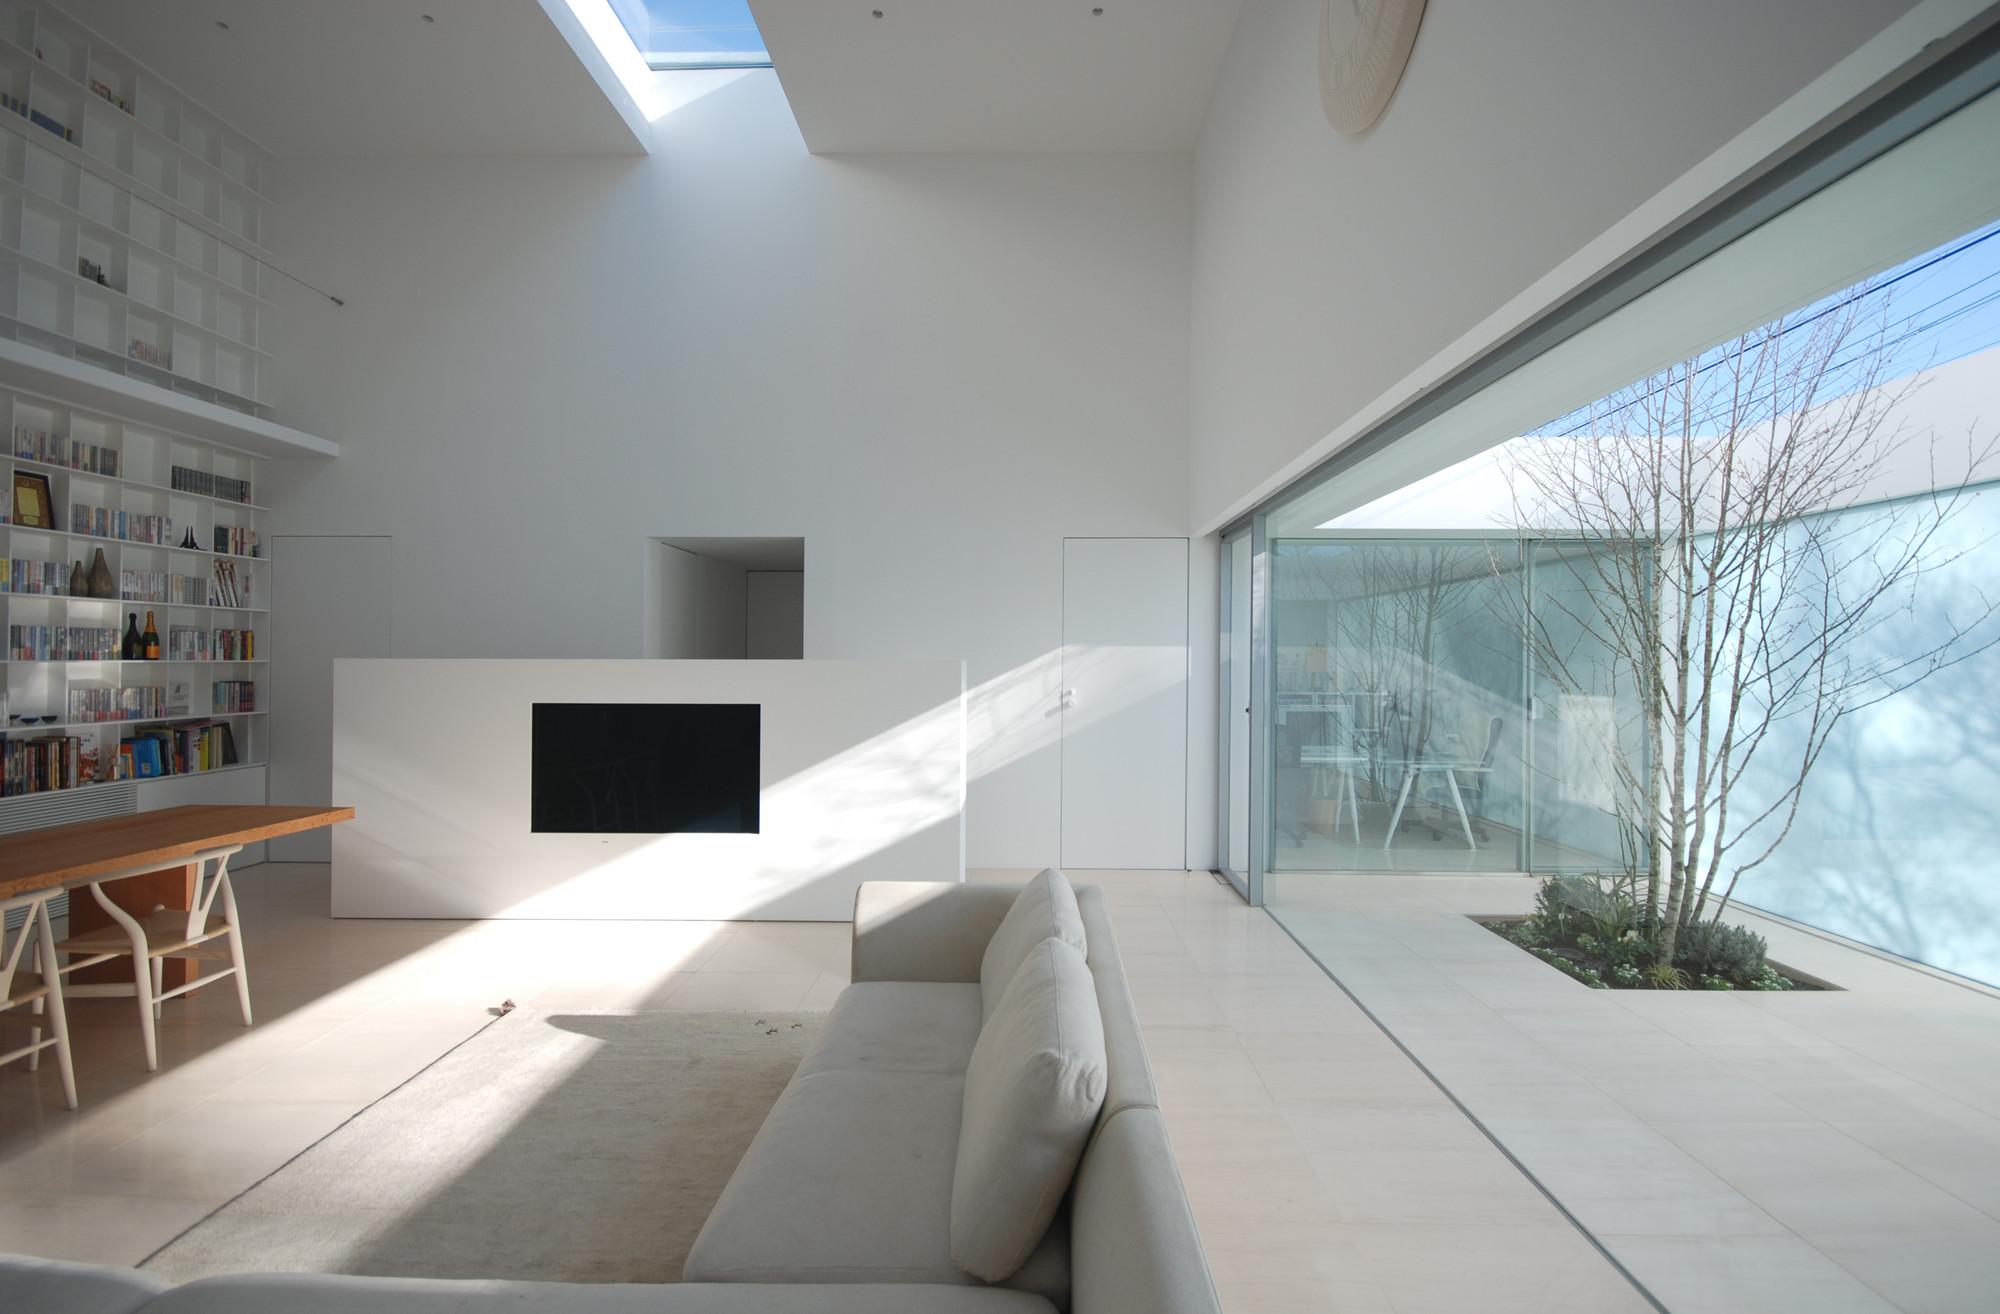 Gallery Of Library House Shinichi Ogawa Amp Associates 10